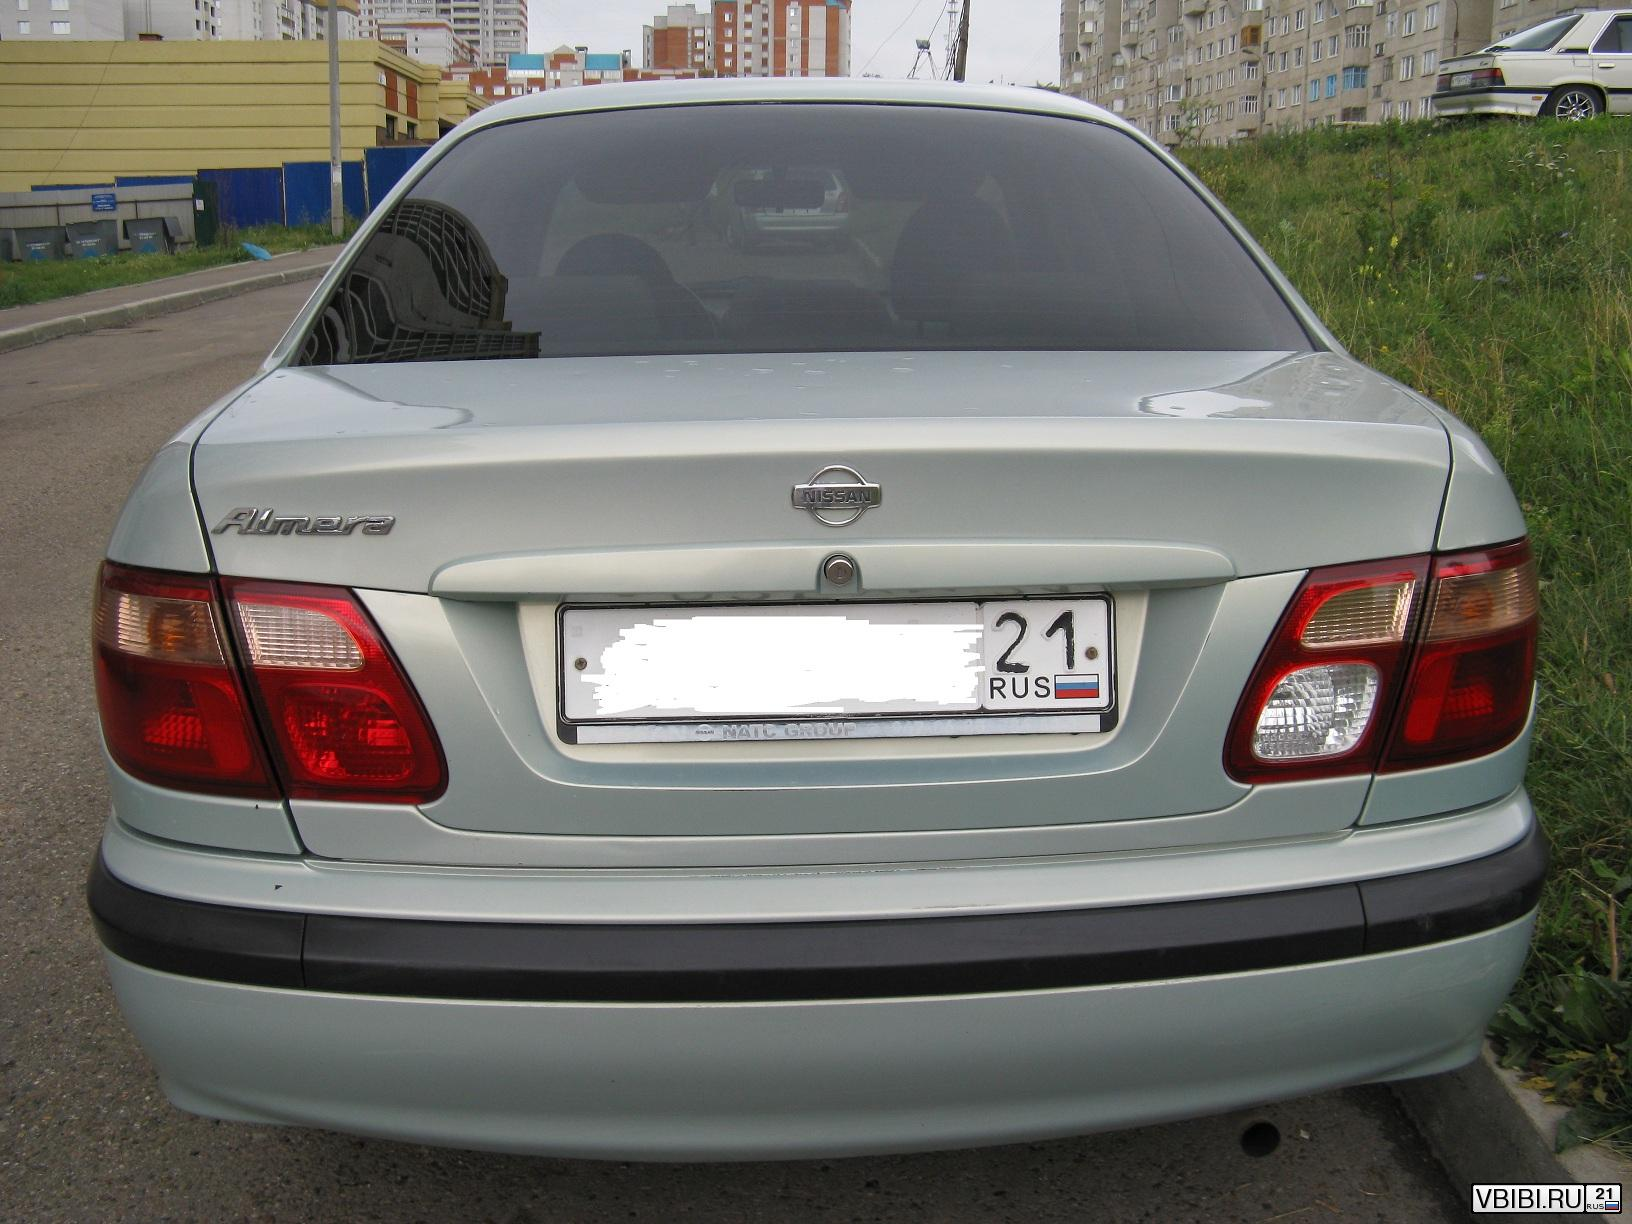 Nissan Almera полная 2002